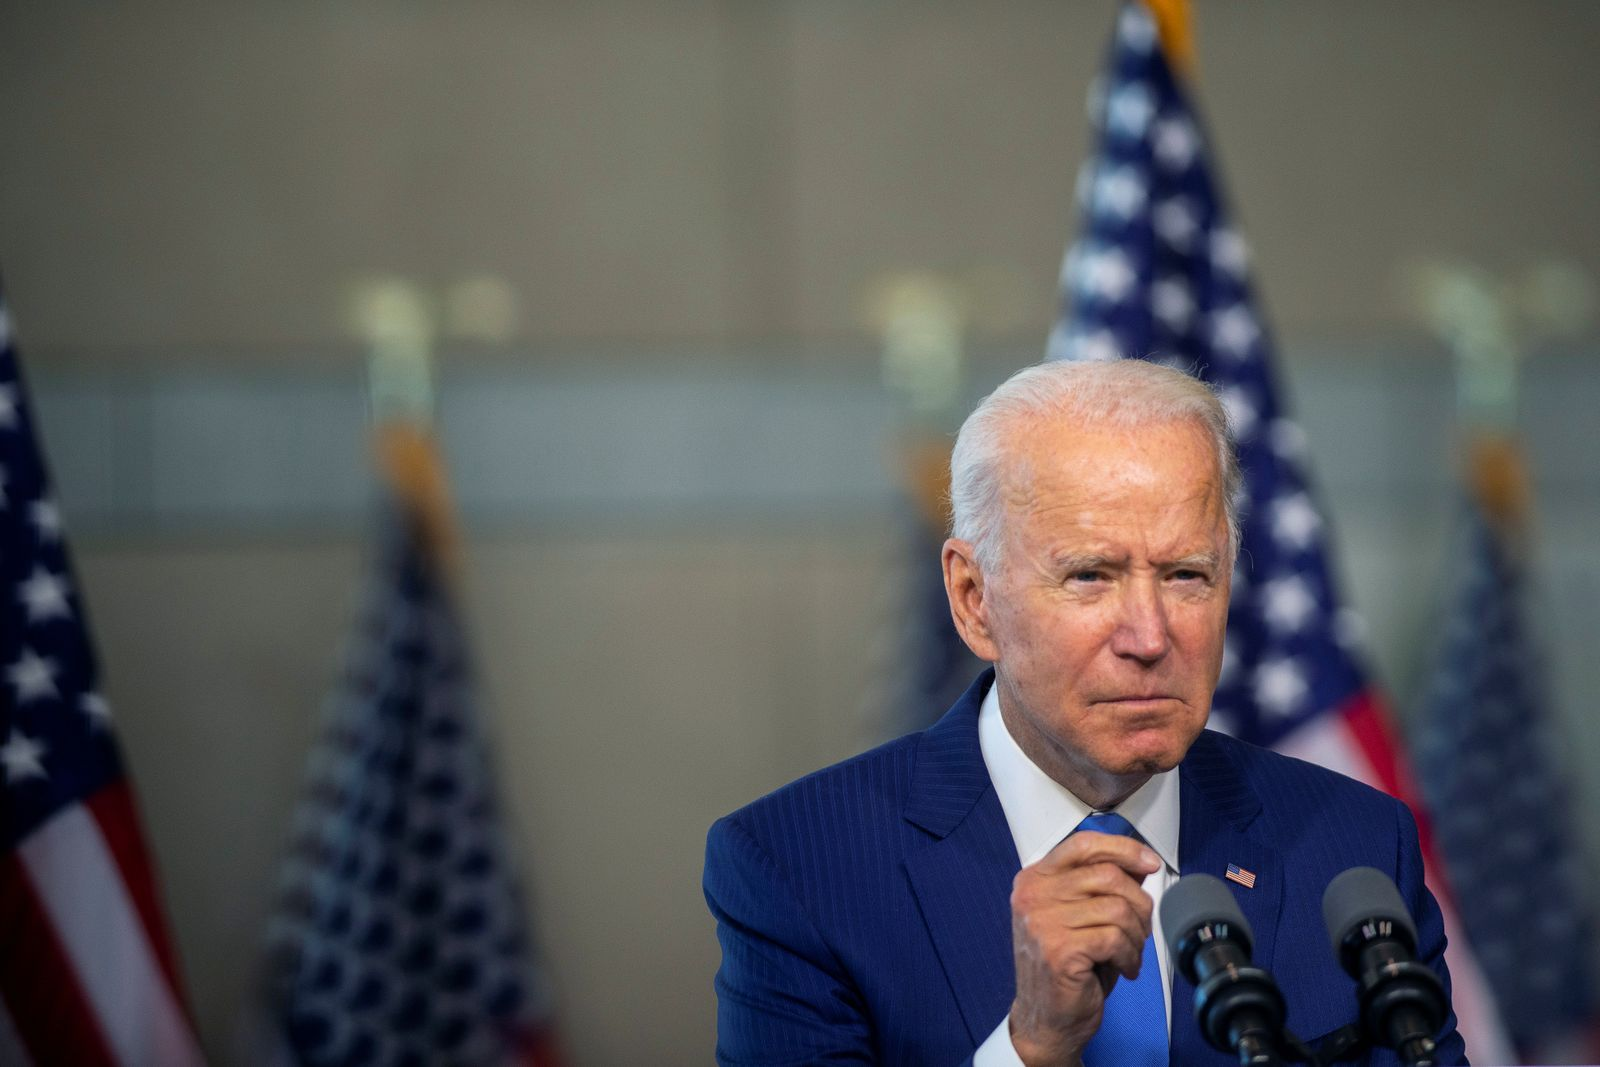 Democratic U.S. presidential nominee Biden delivers remarks in Philadelphia, Pennsylvania